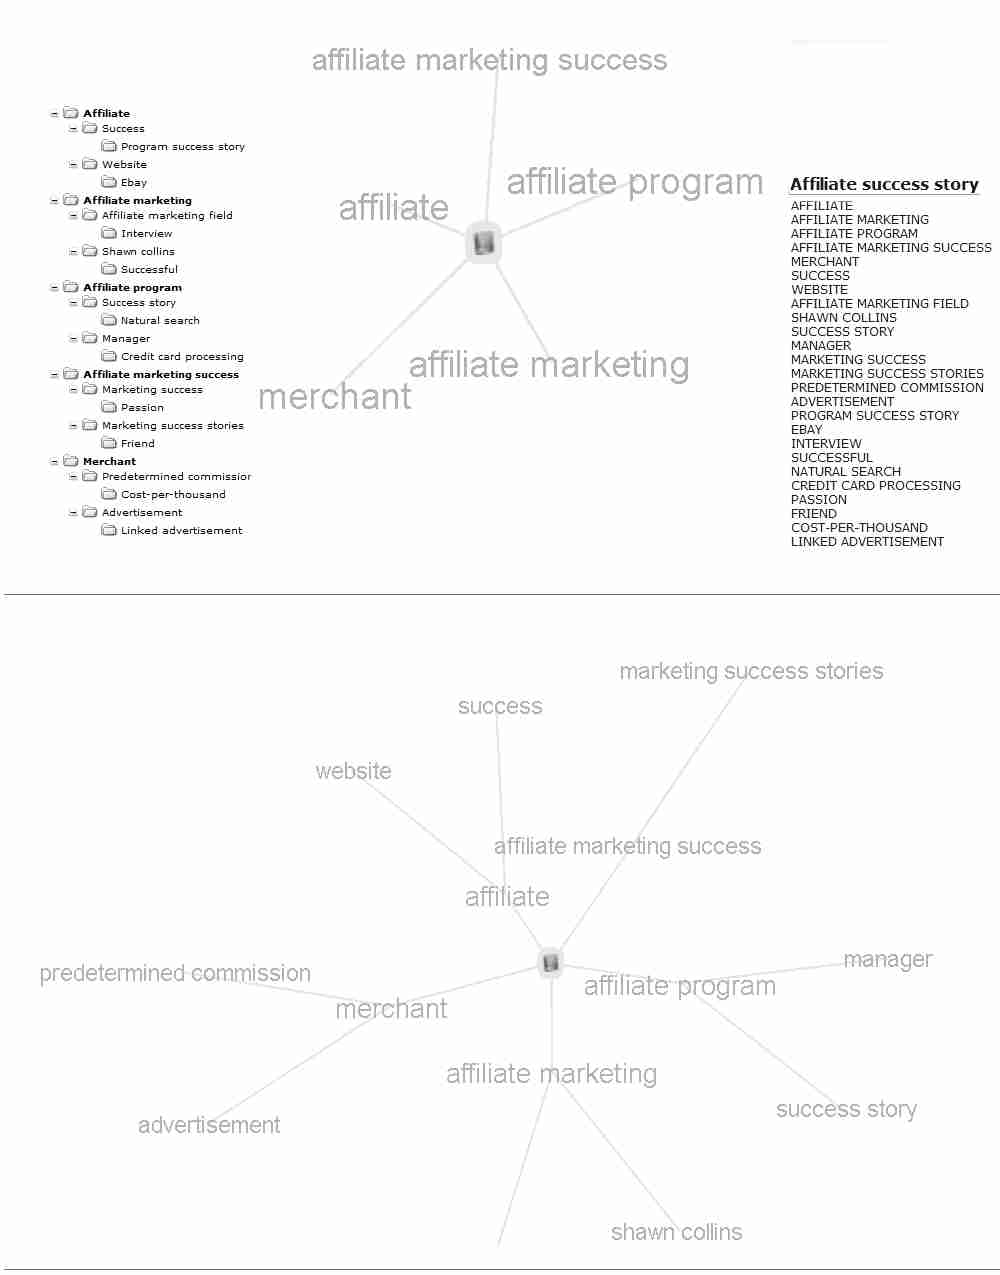 Brand Resonance and Semantic Internet Marketing Software